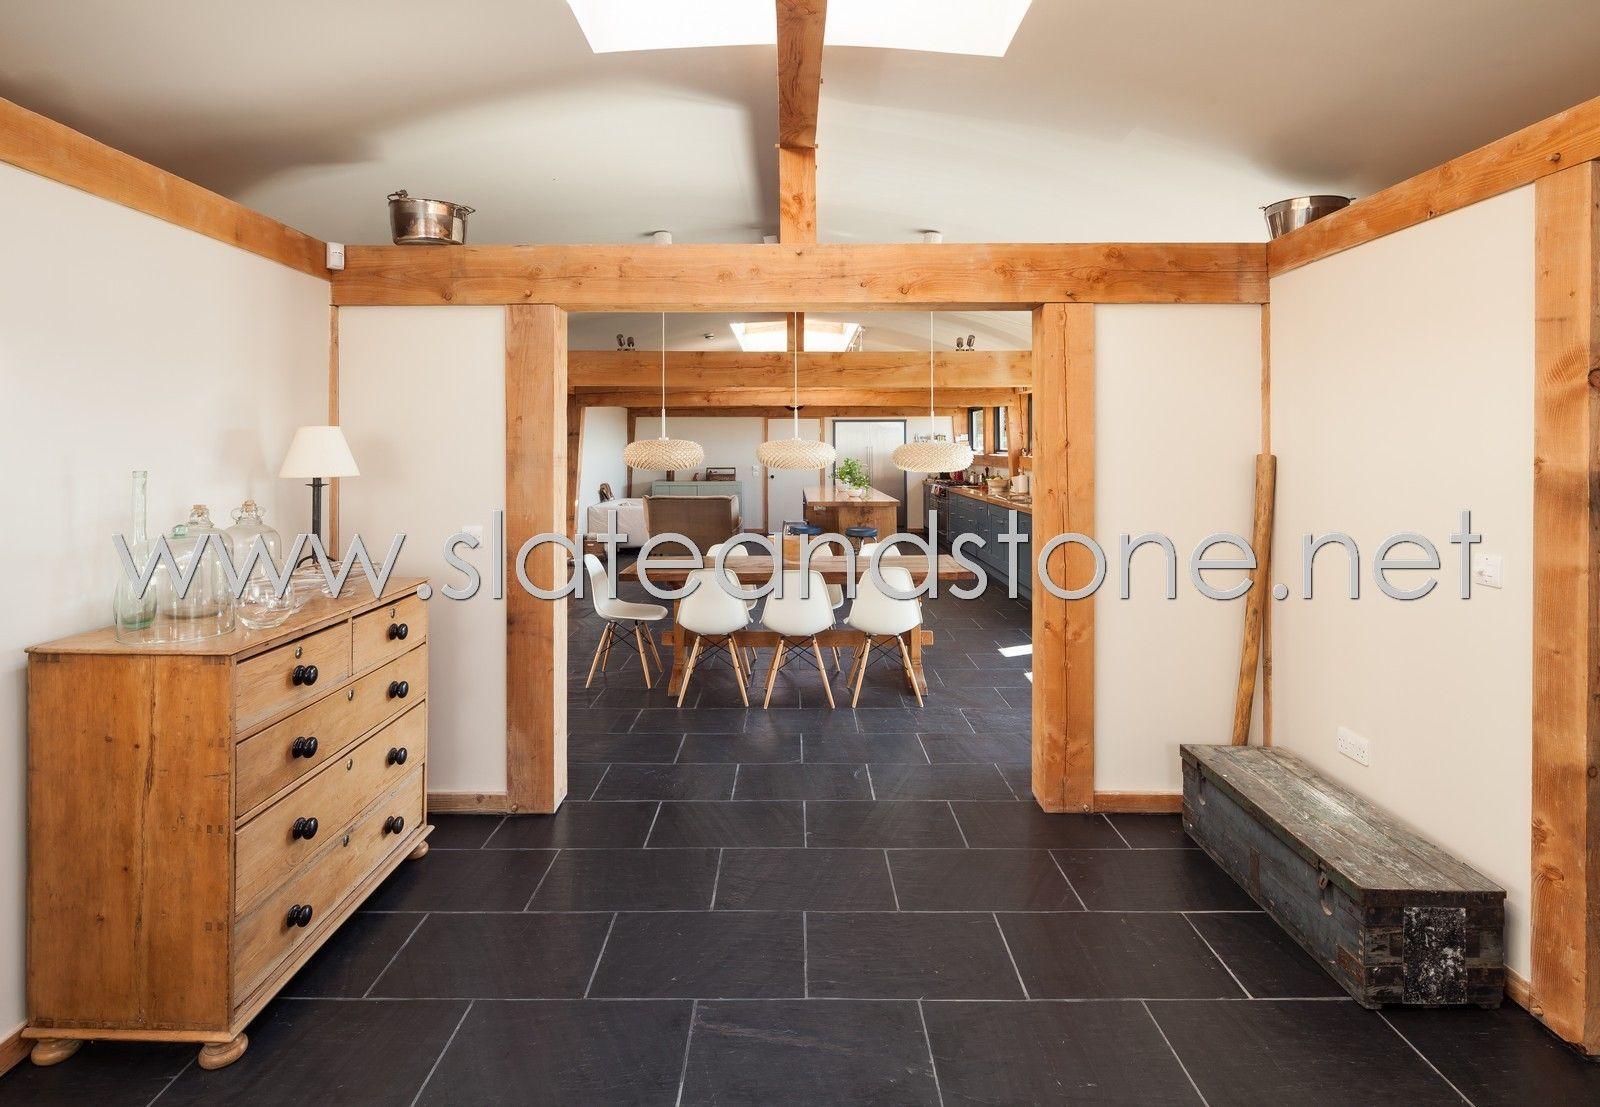 Welsh slate floor tiles 600x300x12mm natural riven gauged ebay welsh slate floor tiles 600x300x12mm natural riven gauged ebay dailygadgetfo Images